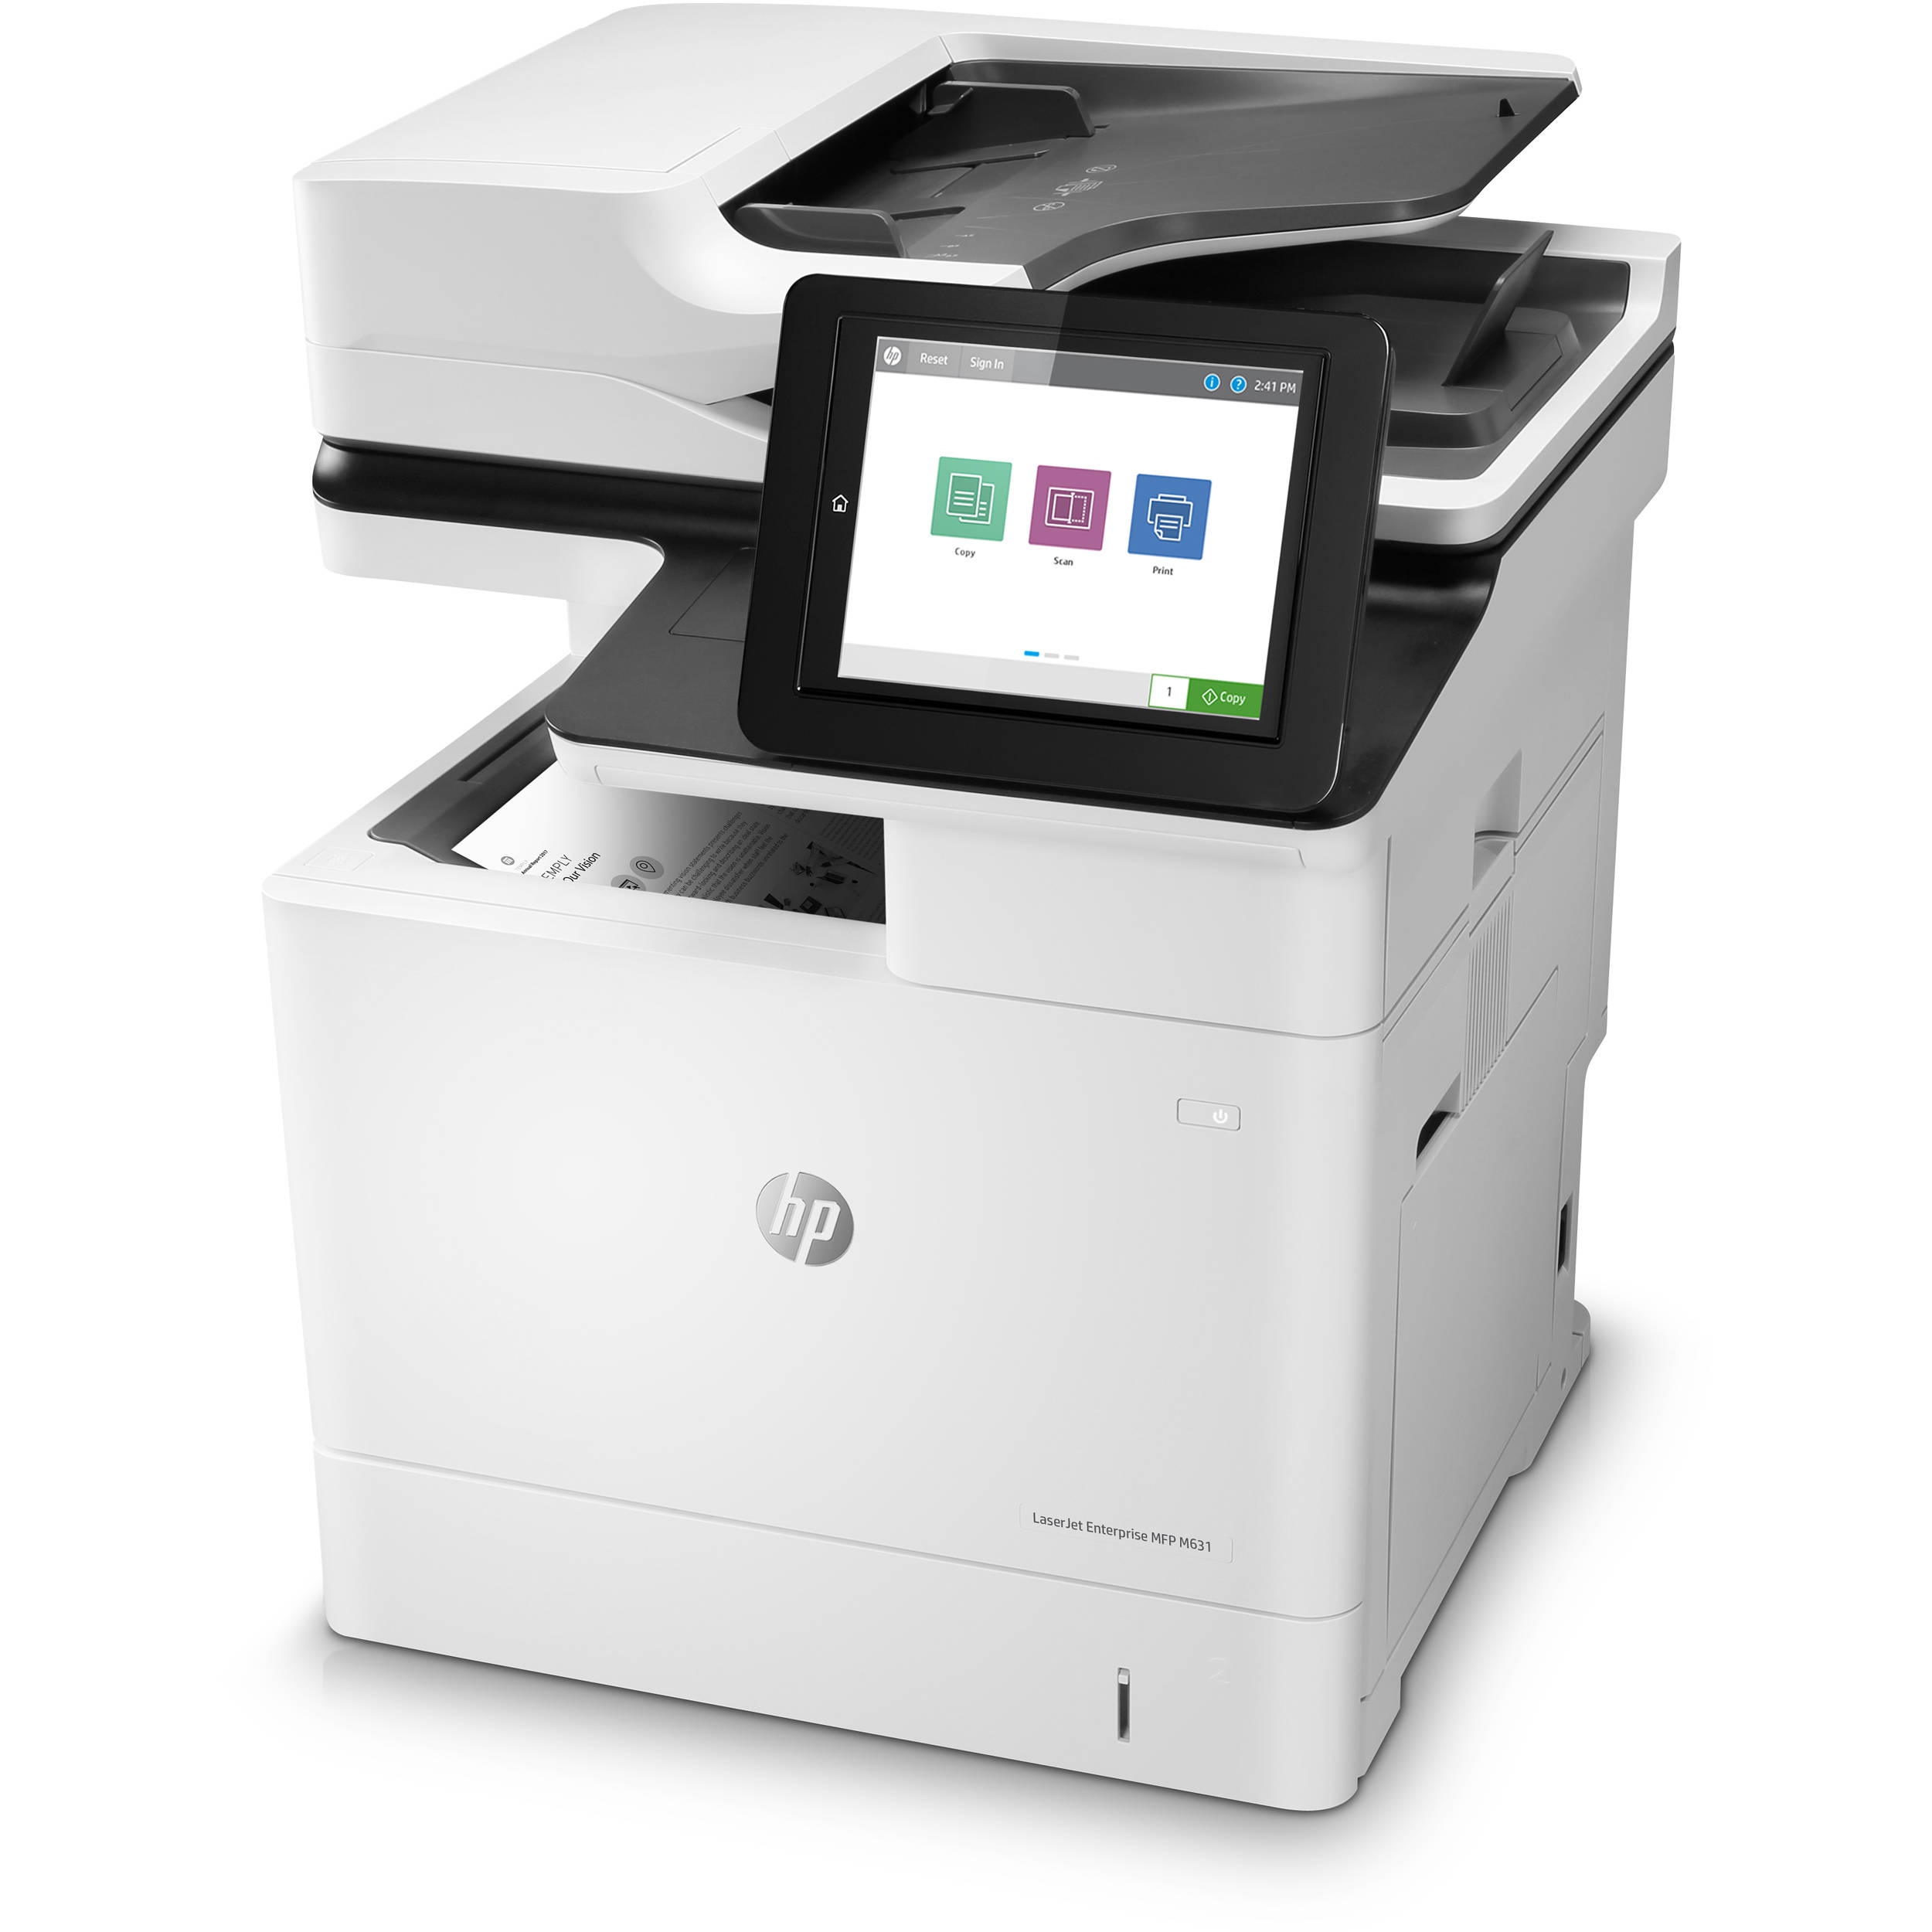 HP LaserJet Enterprise M631dn Monochrome All-In-One Laser Printer